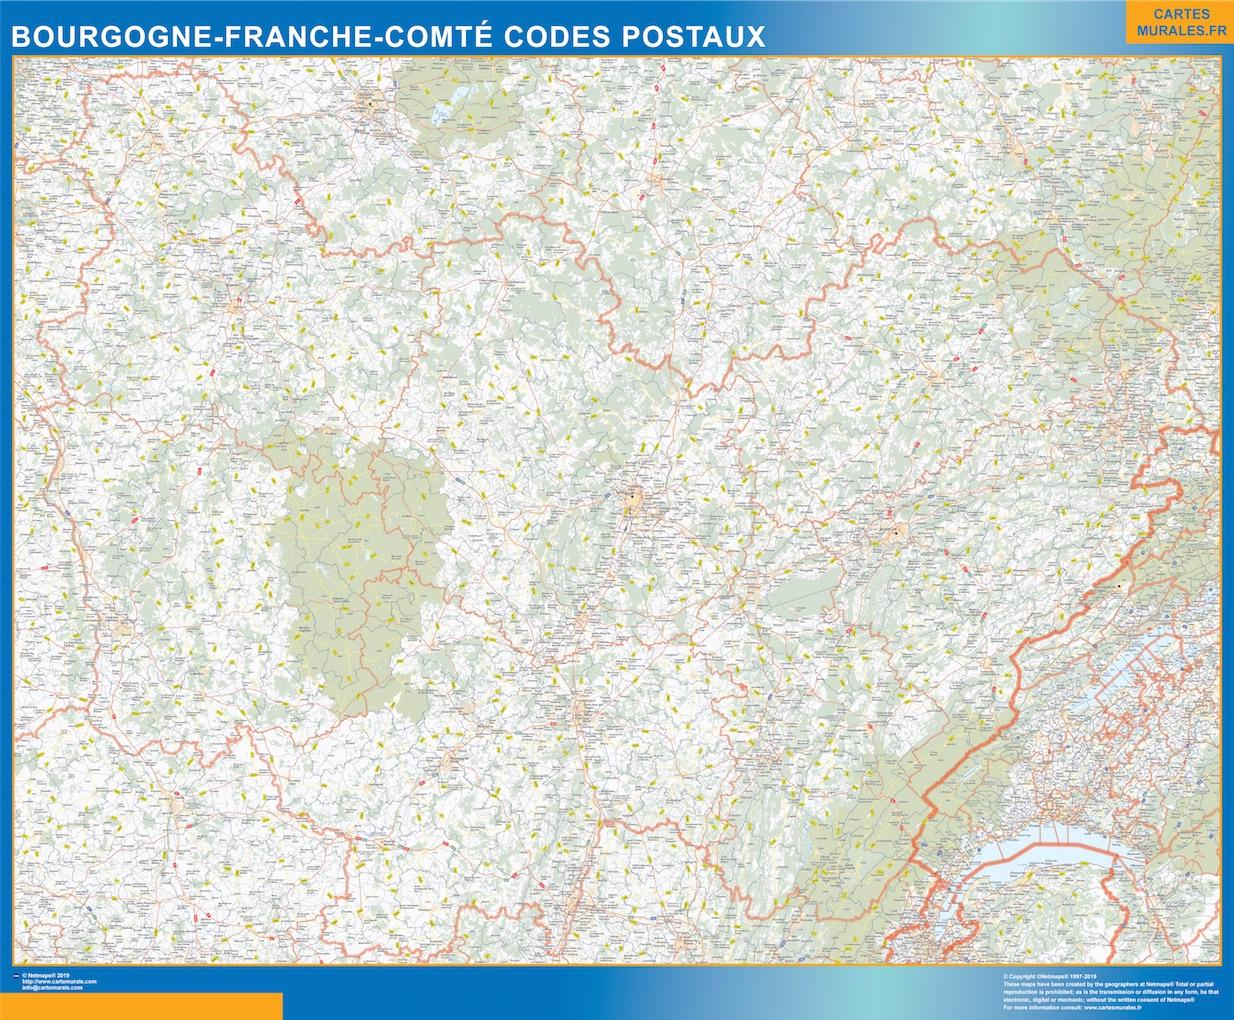 Carte Bourgogne Franche Comte codes postaux